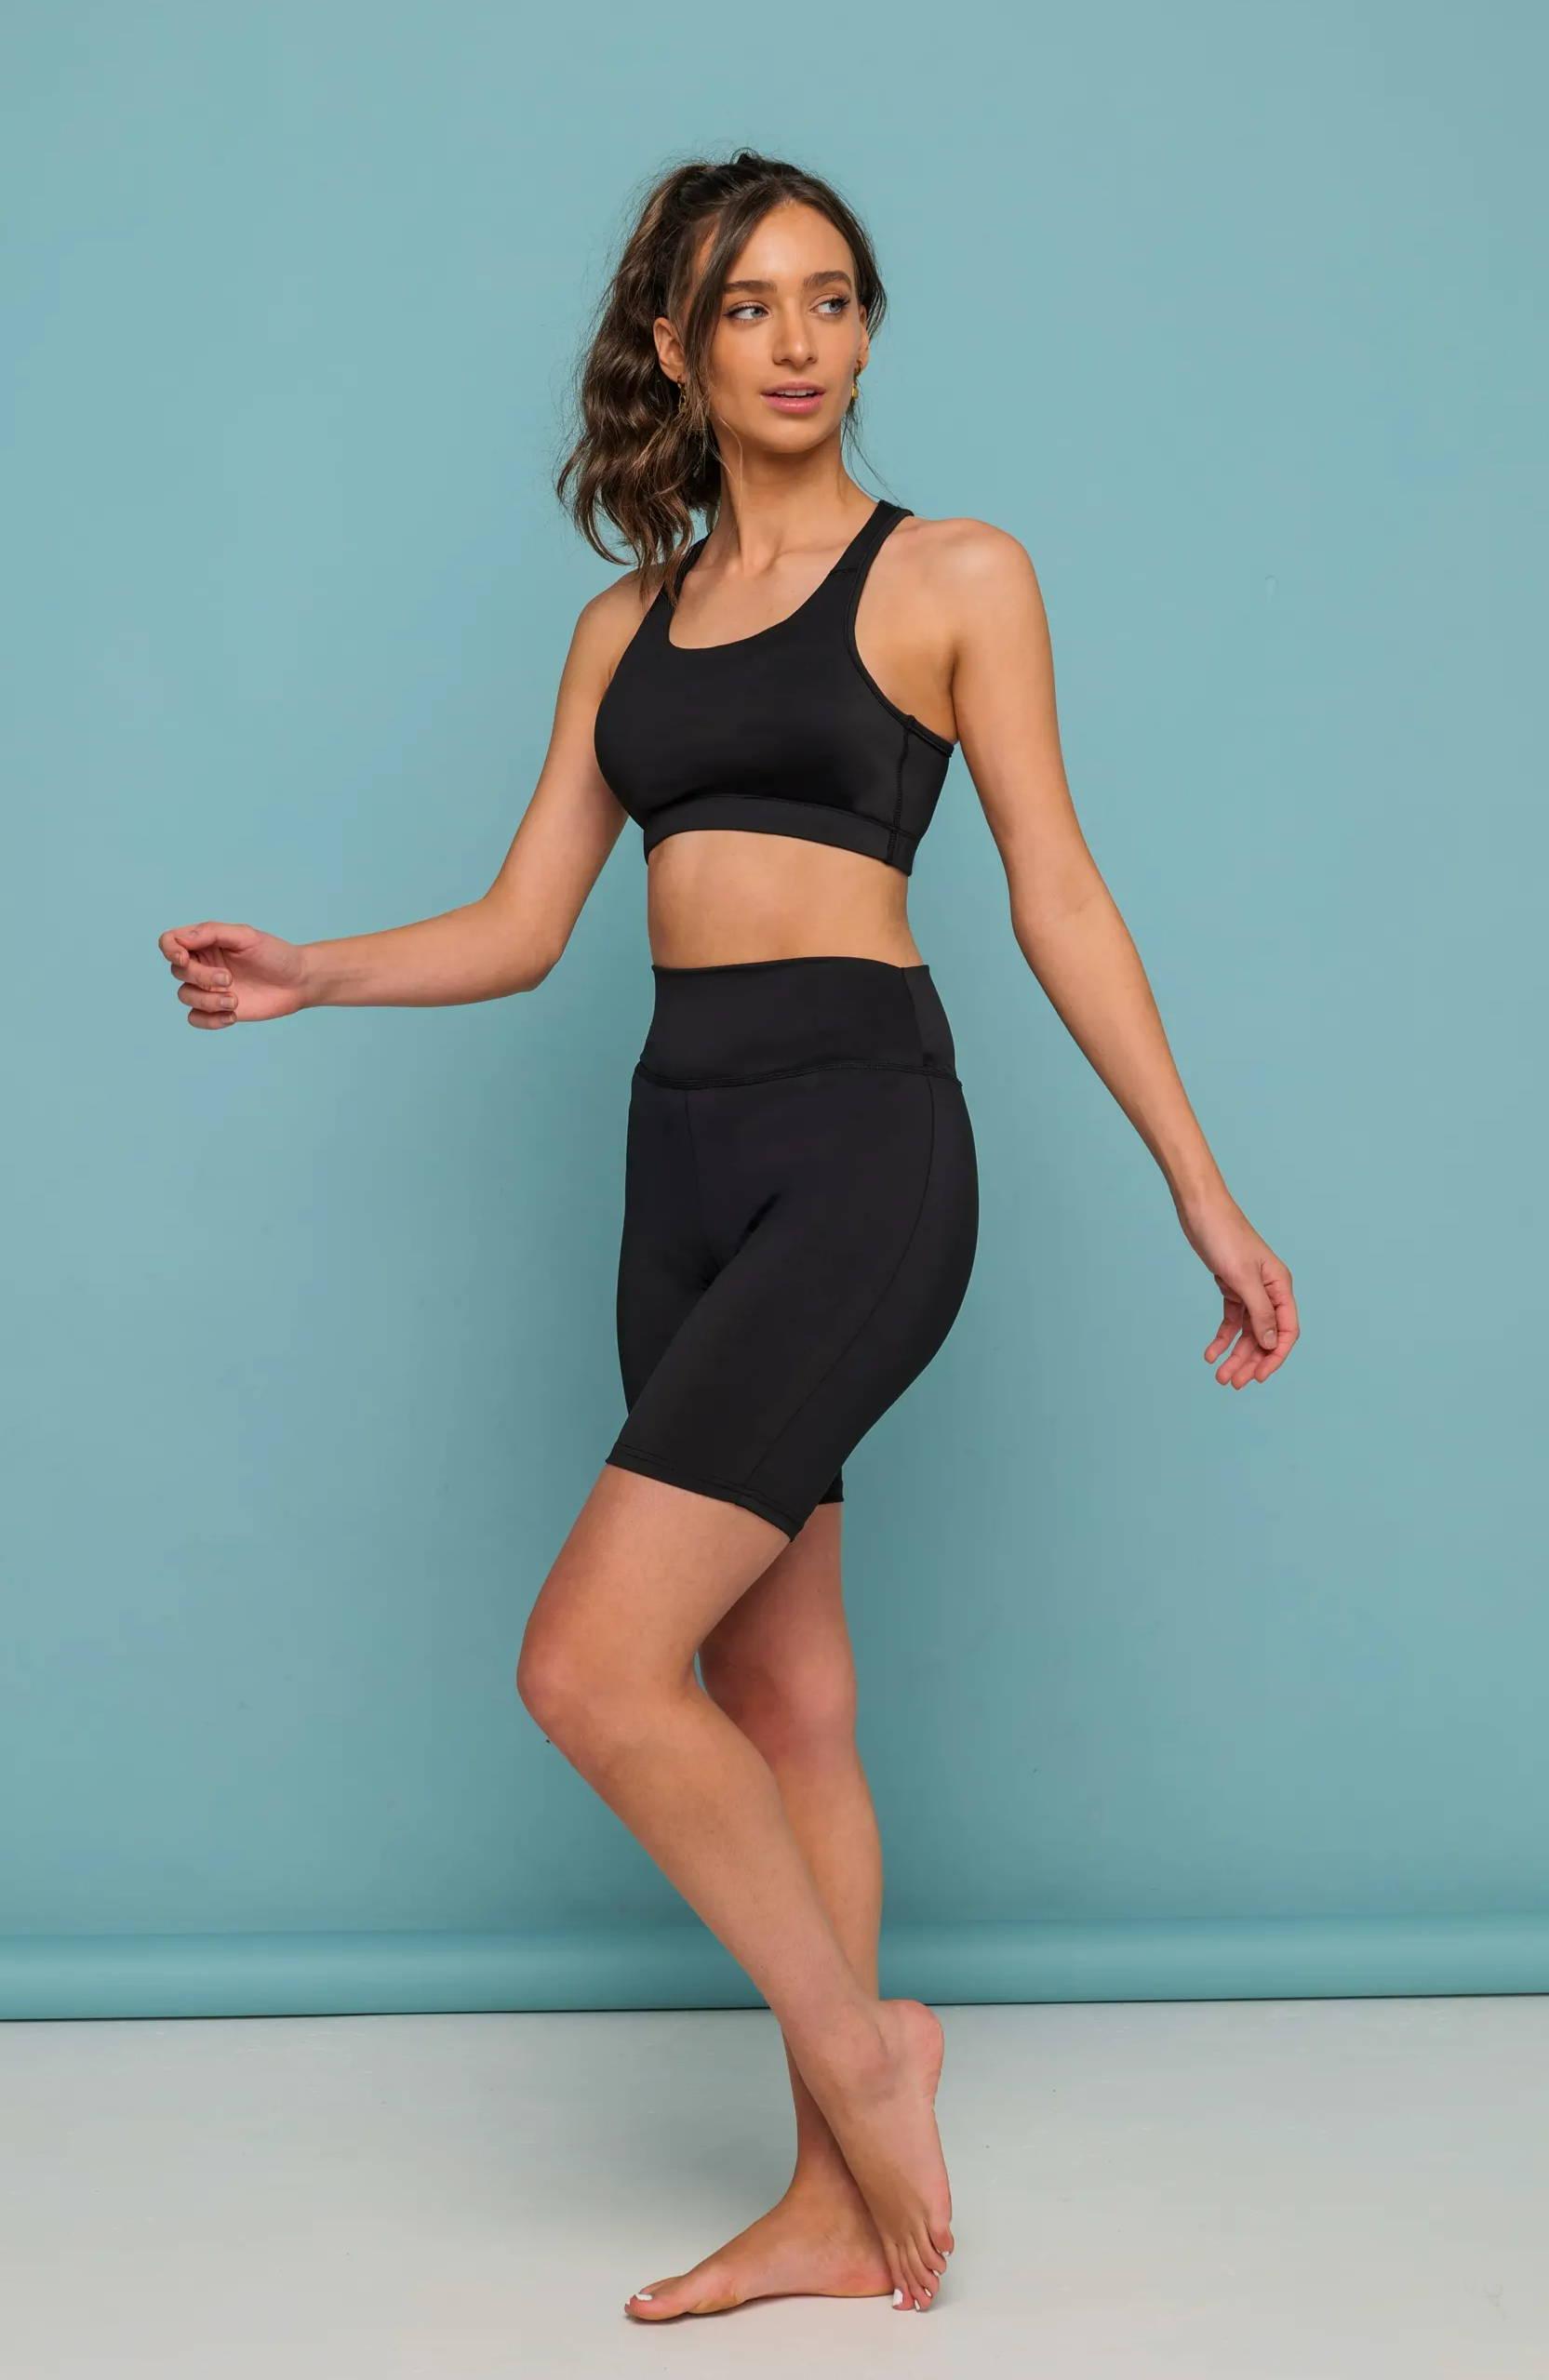 wholesale activewear suppliers